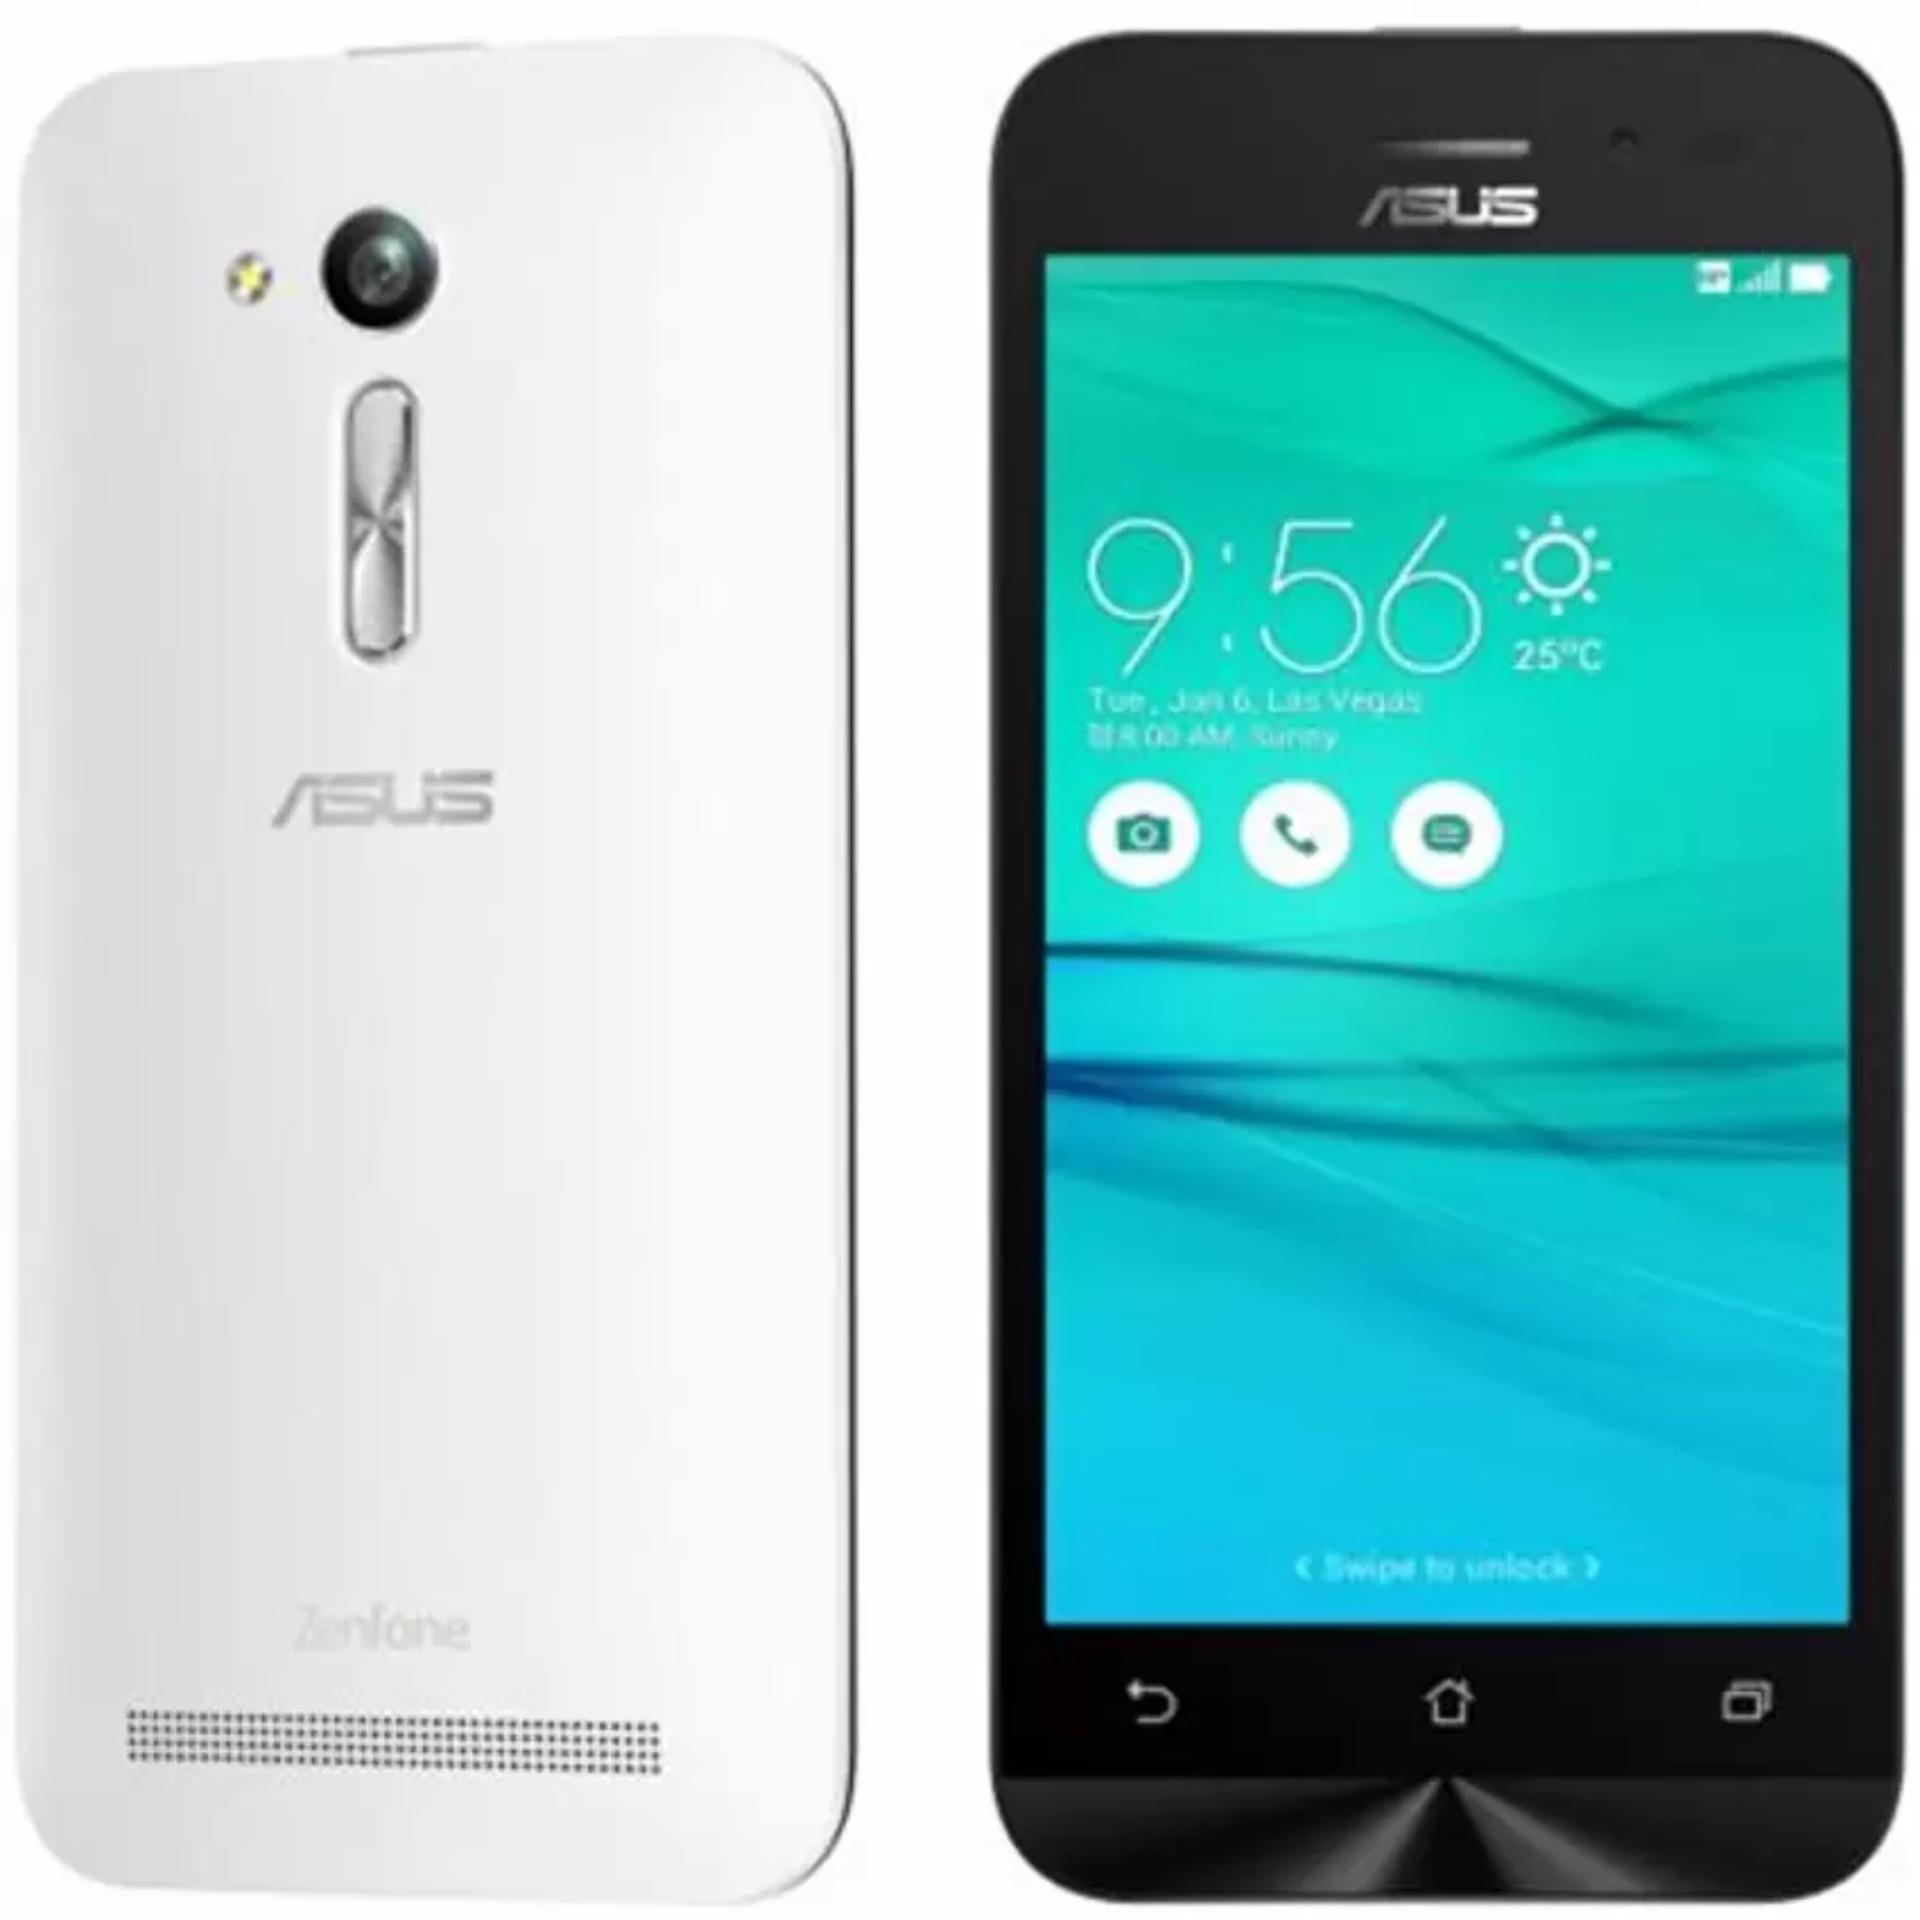 Cara Hemat Asus Zenfone 4 Max Pro Zc554kl 55 Jual Notebook Go 1 8gb Garansi Resmi Zb500kg Zb450kl 4g Lte